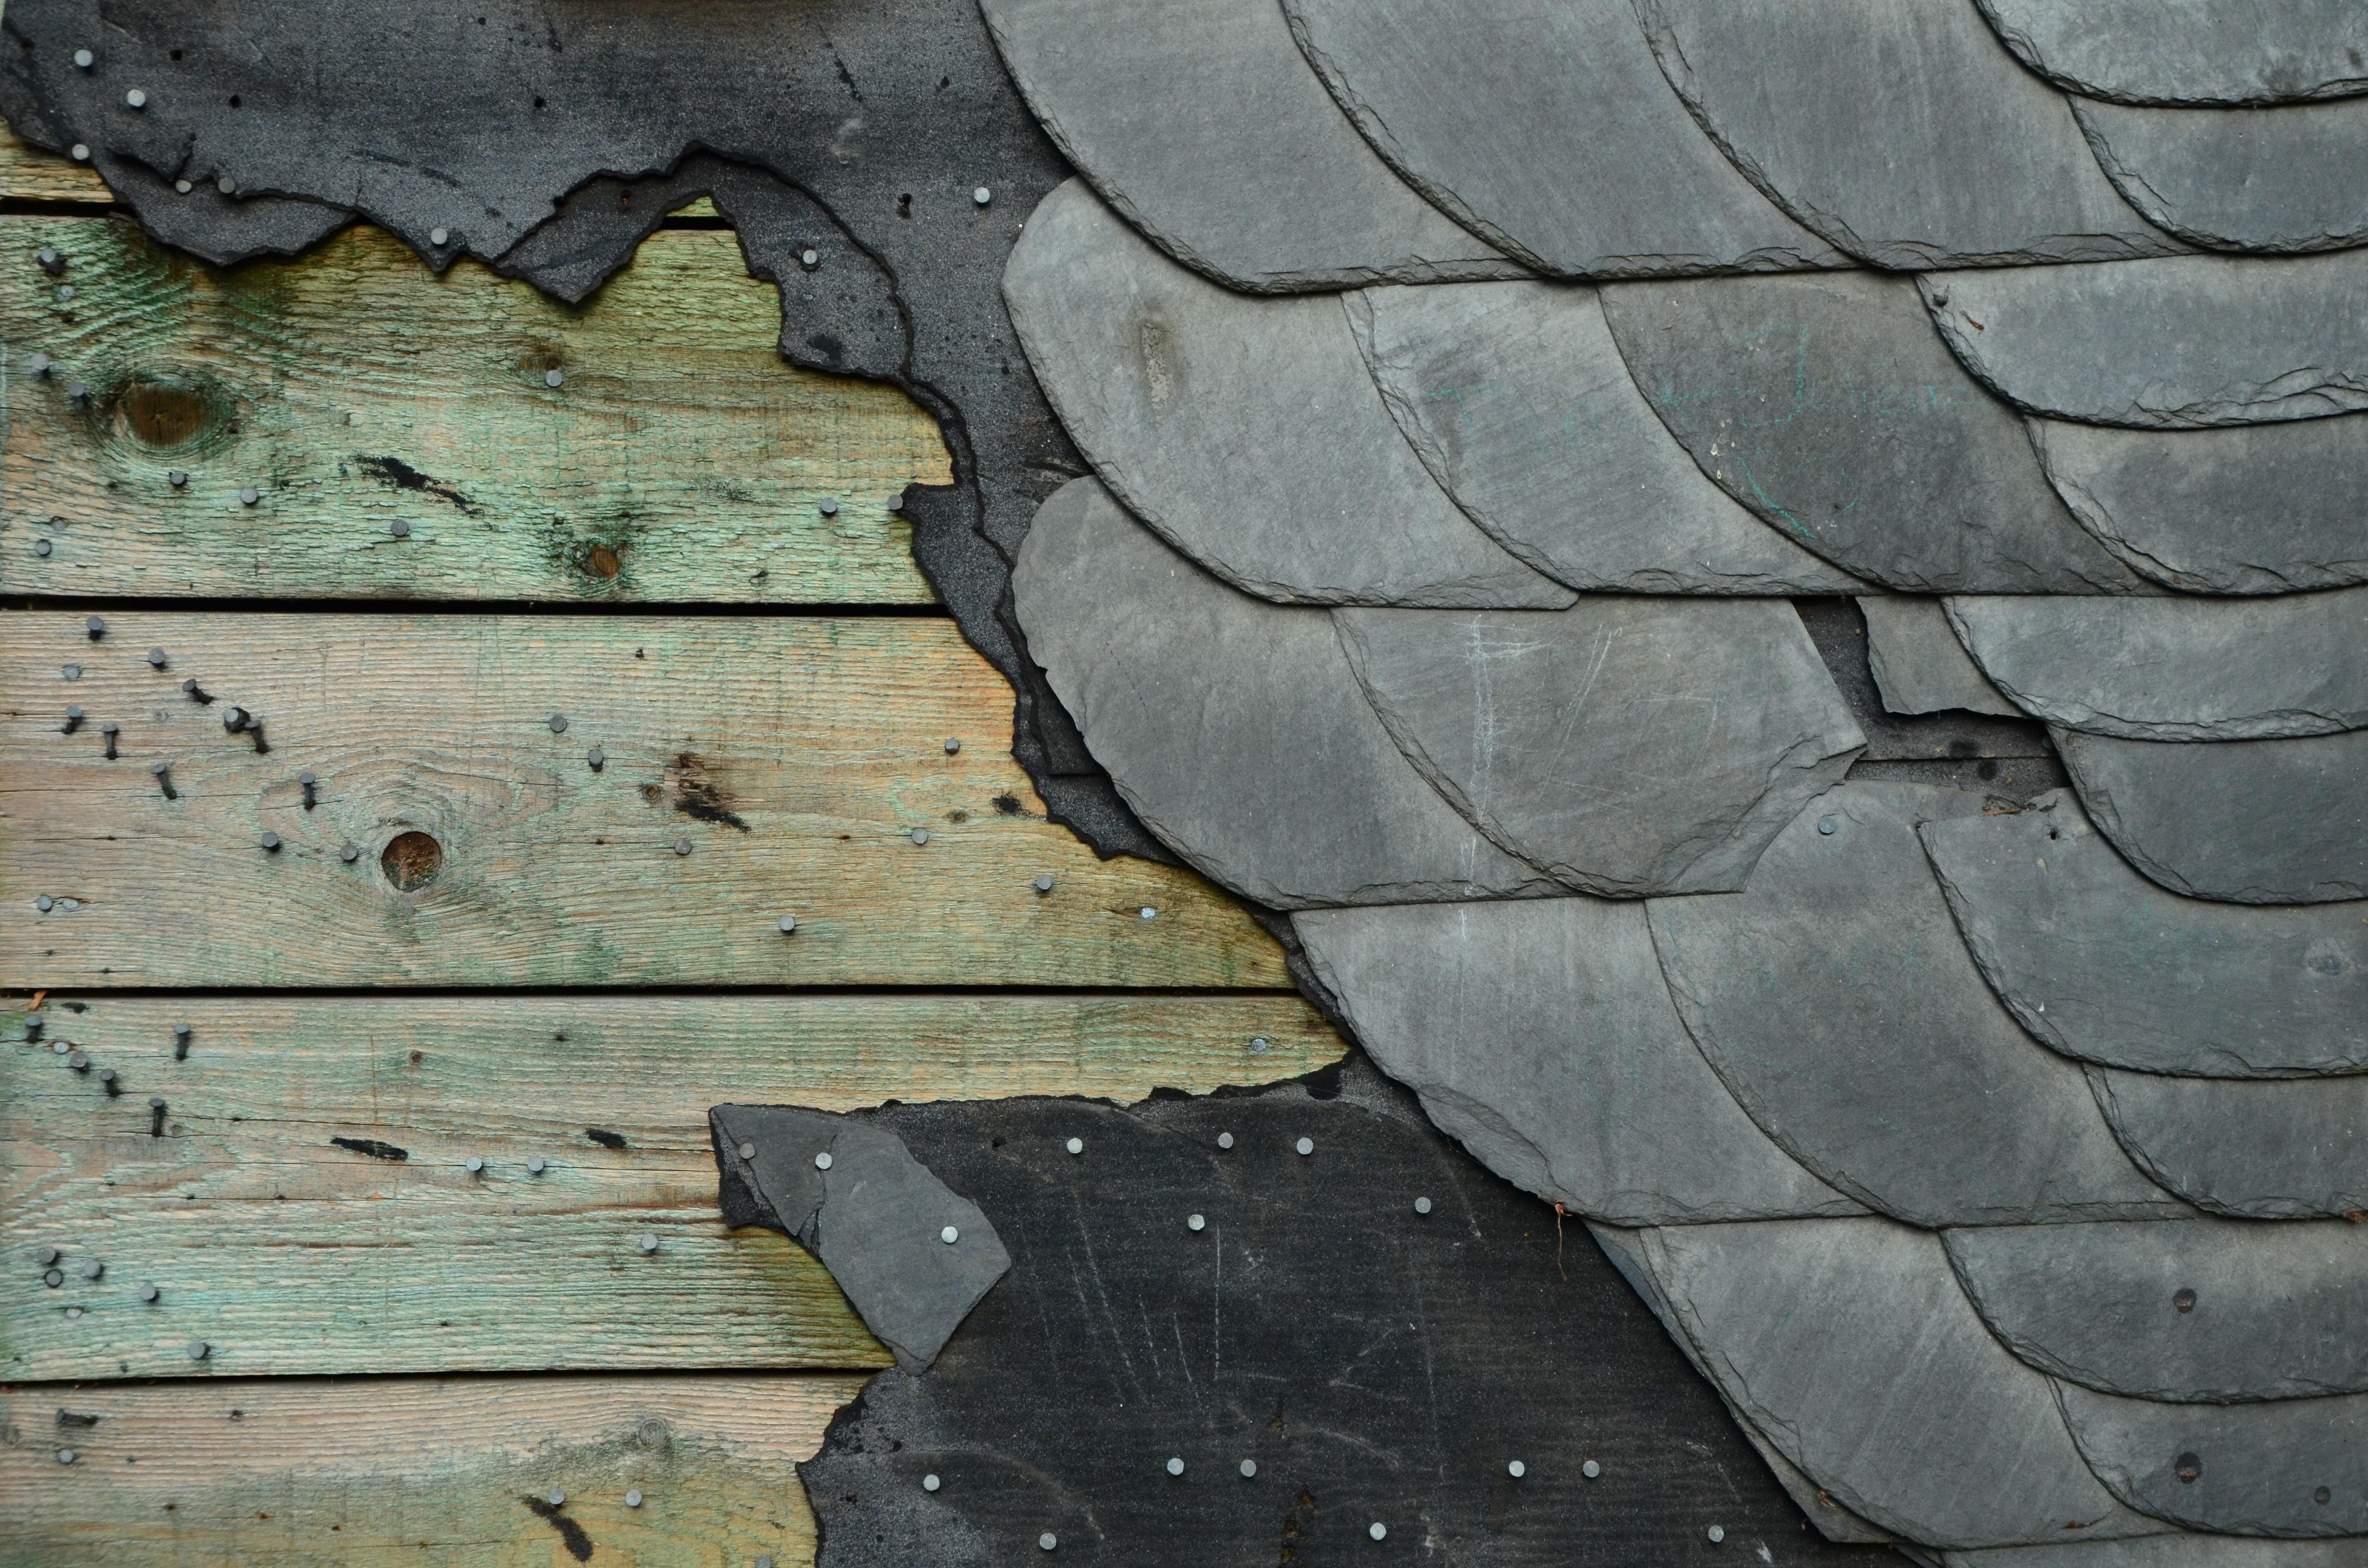 Fotos gratis : rock, estructura, madera, textura, hoja, piso ...